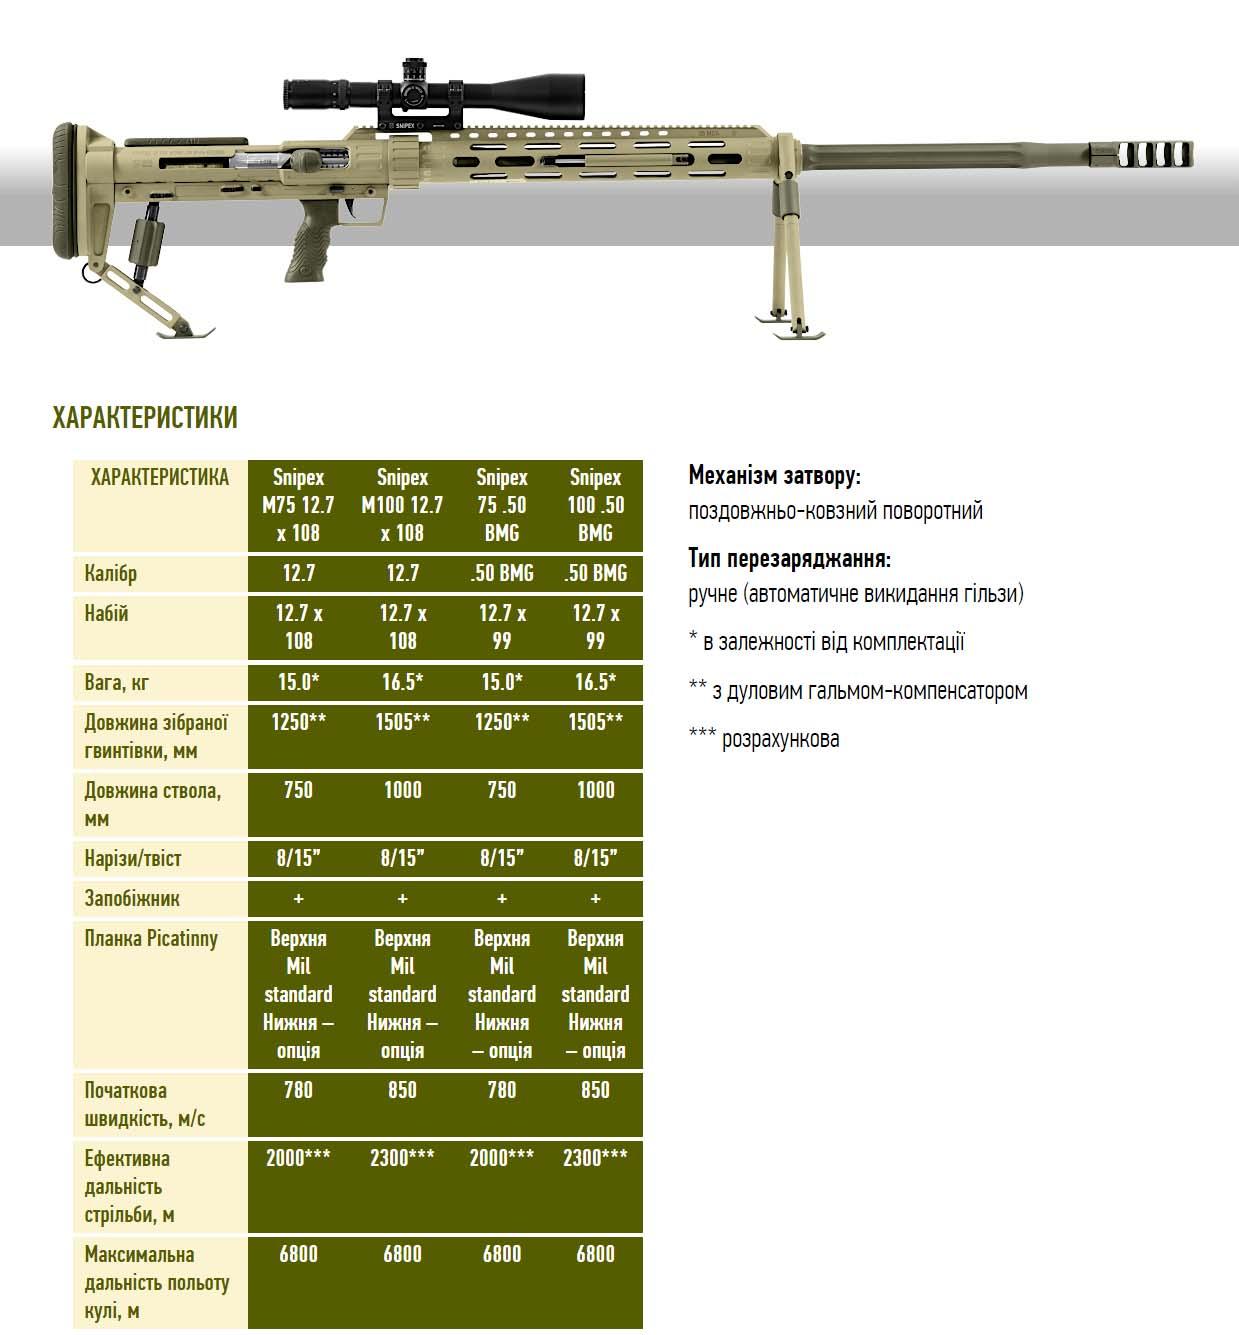 SnipexM100